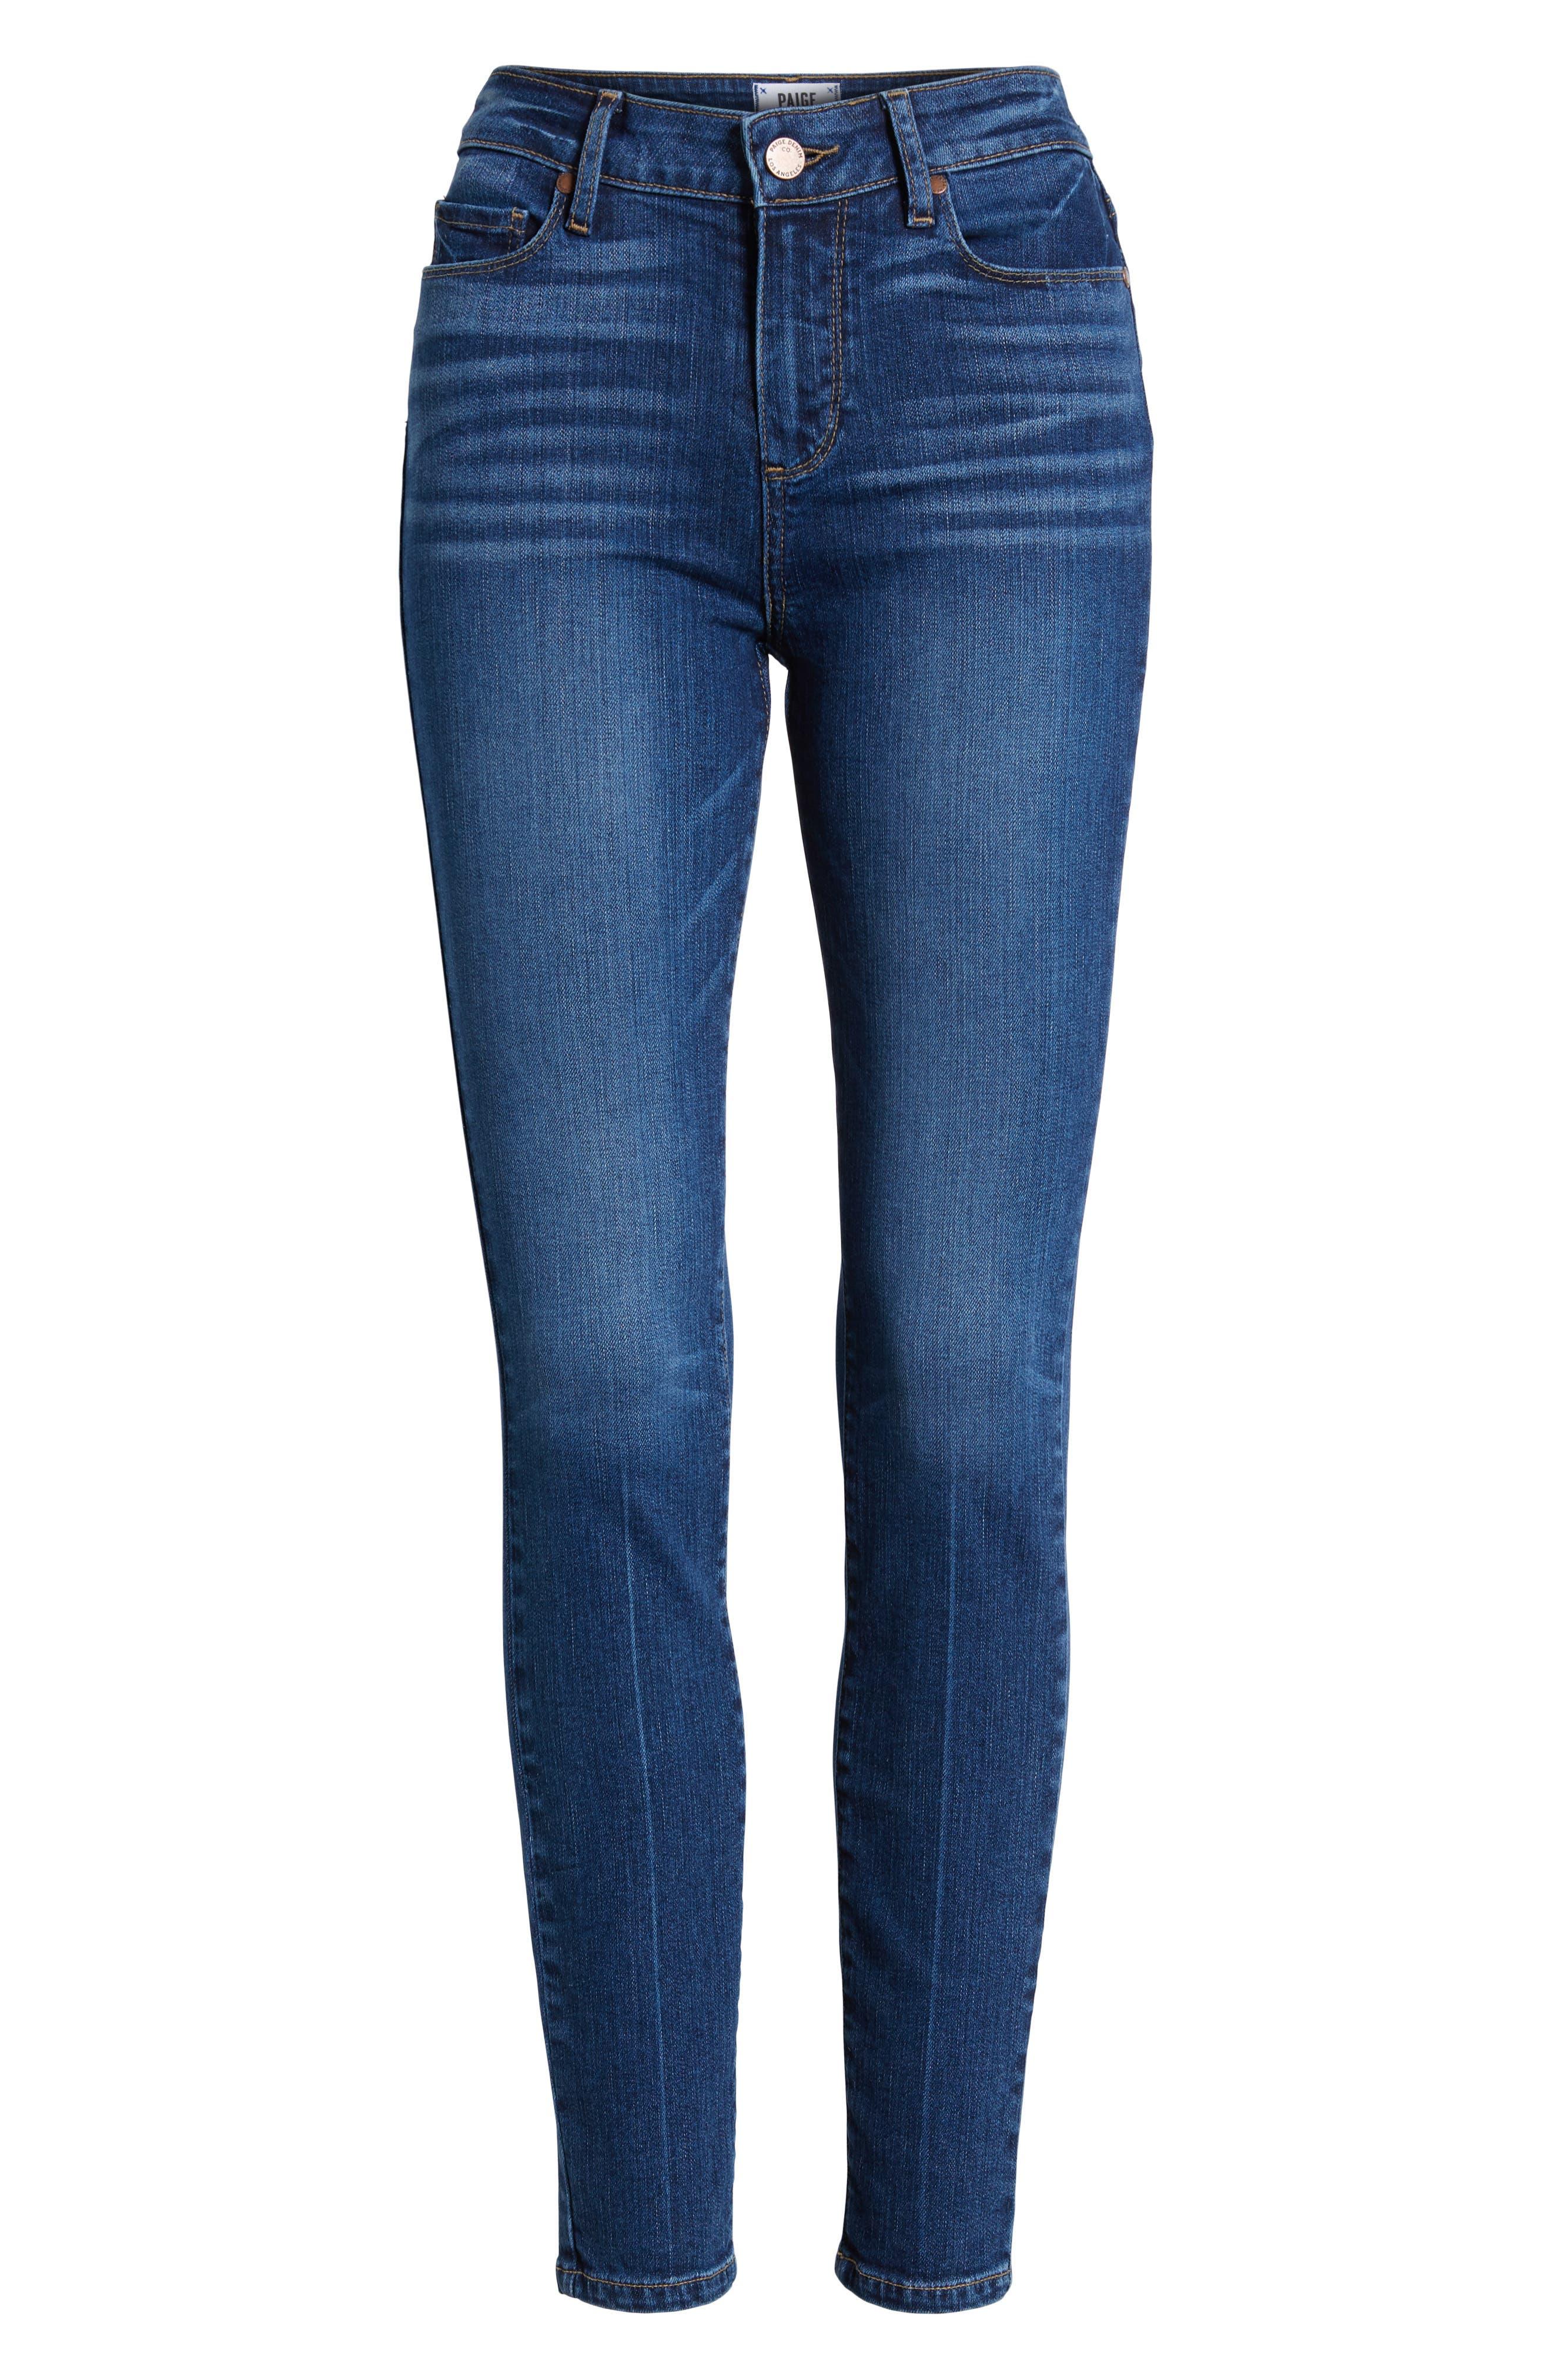 Verdugo Ankle Skinny Jeans,                             Alternate thumbnail 7, color,                             400